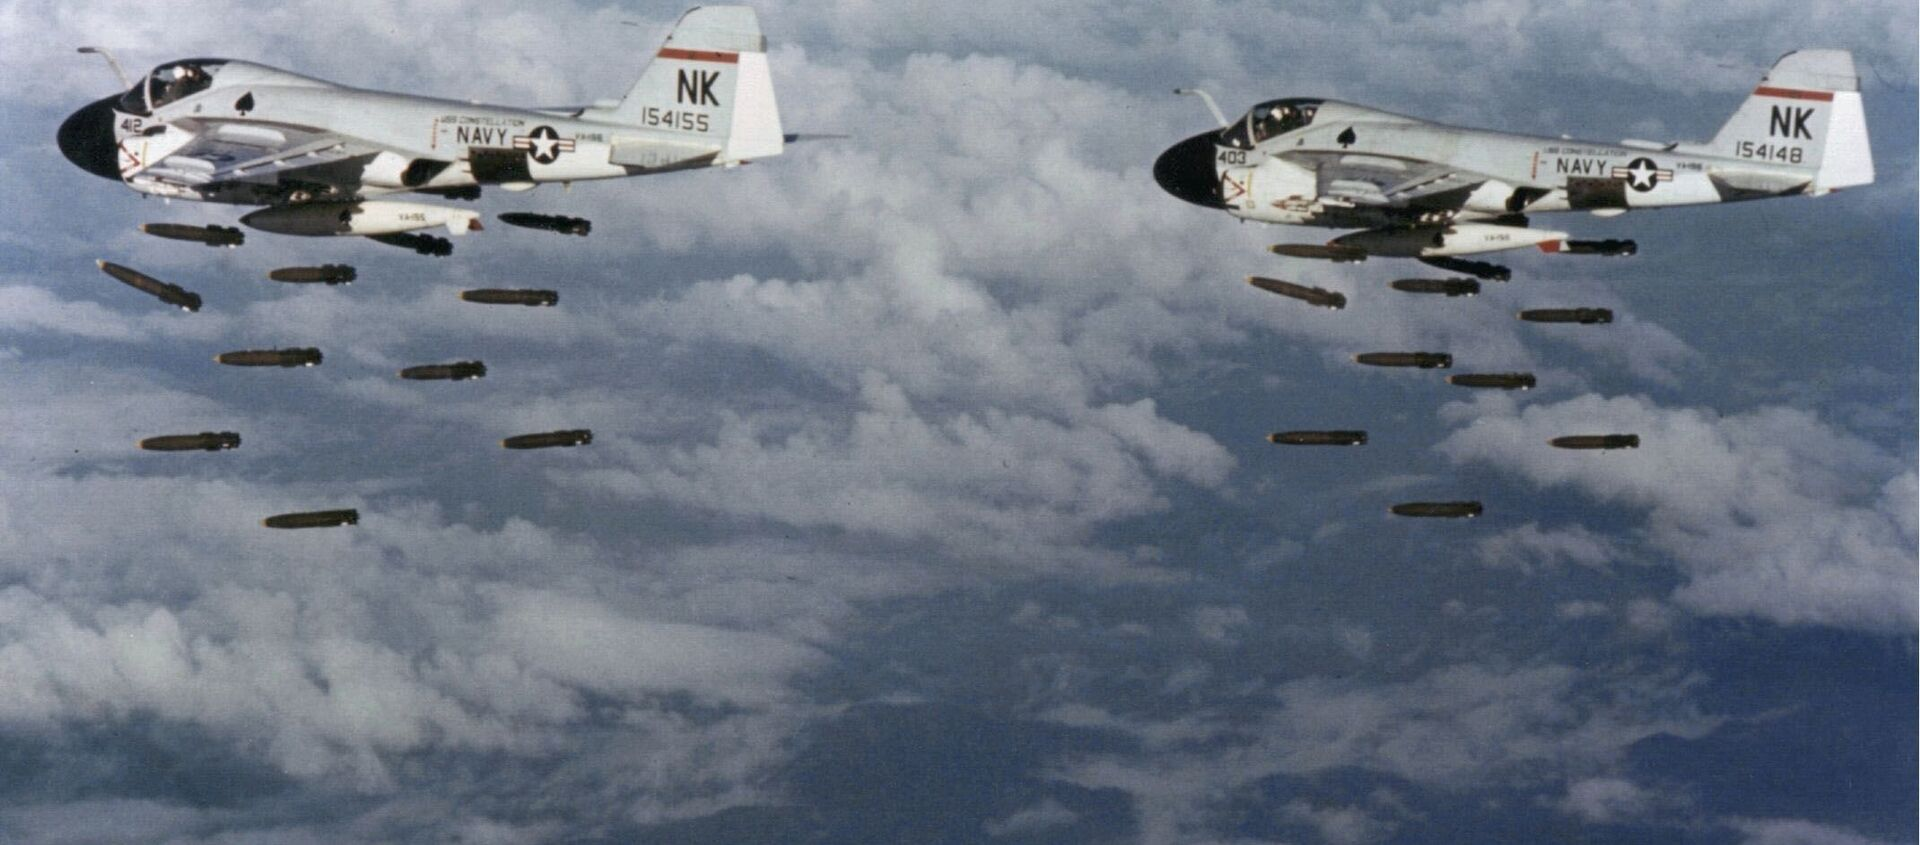 Dos bombarderos Grumman A-6A Intruder lanzan bombas contra Vietnam - Sputnik Mundo, 1920, 01.03.2020